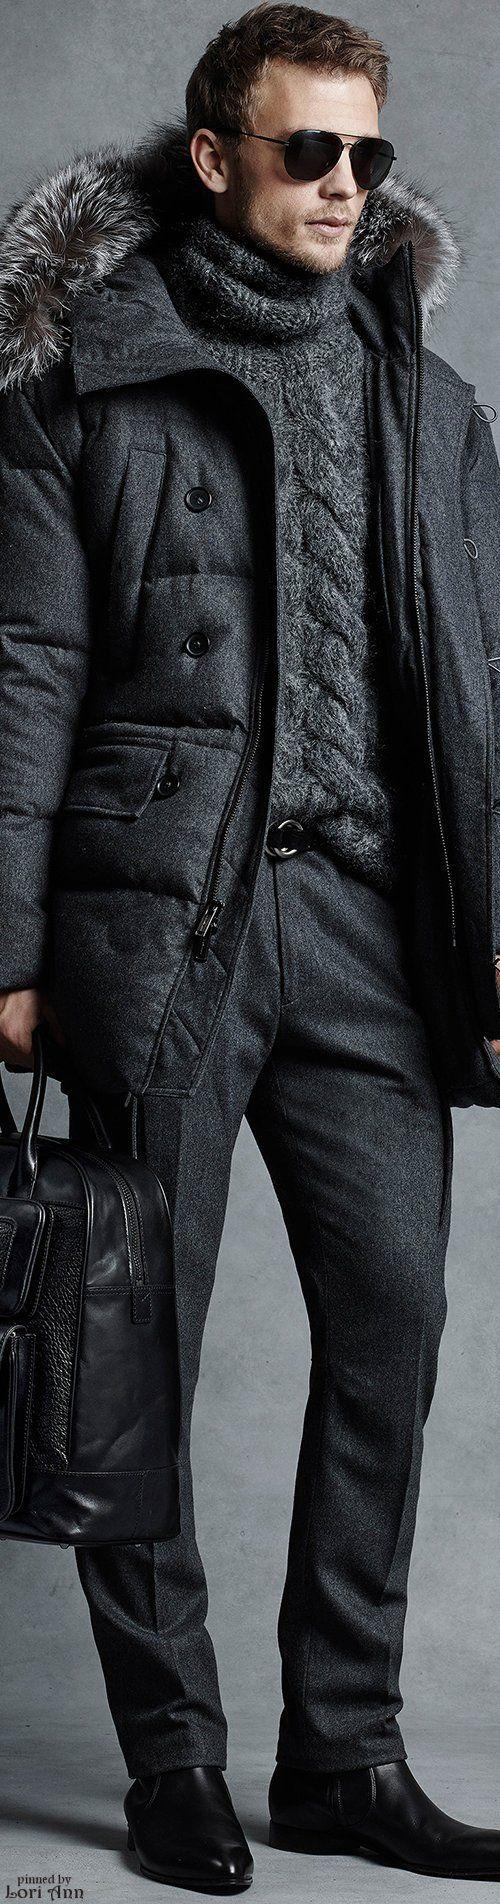 Michael Kors Fall 2015 Menswear | Men's Fashion | Men's Casual Outfit for Fall/winter | Moda Masculina | Shop at designerclothingfans.com